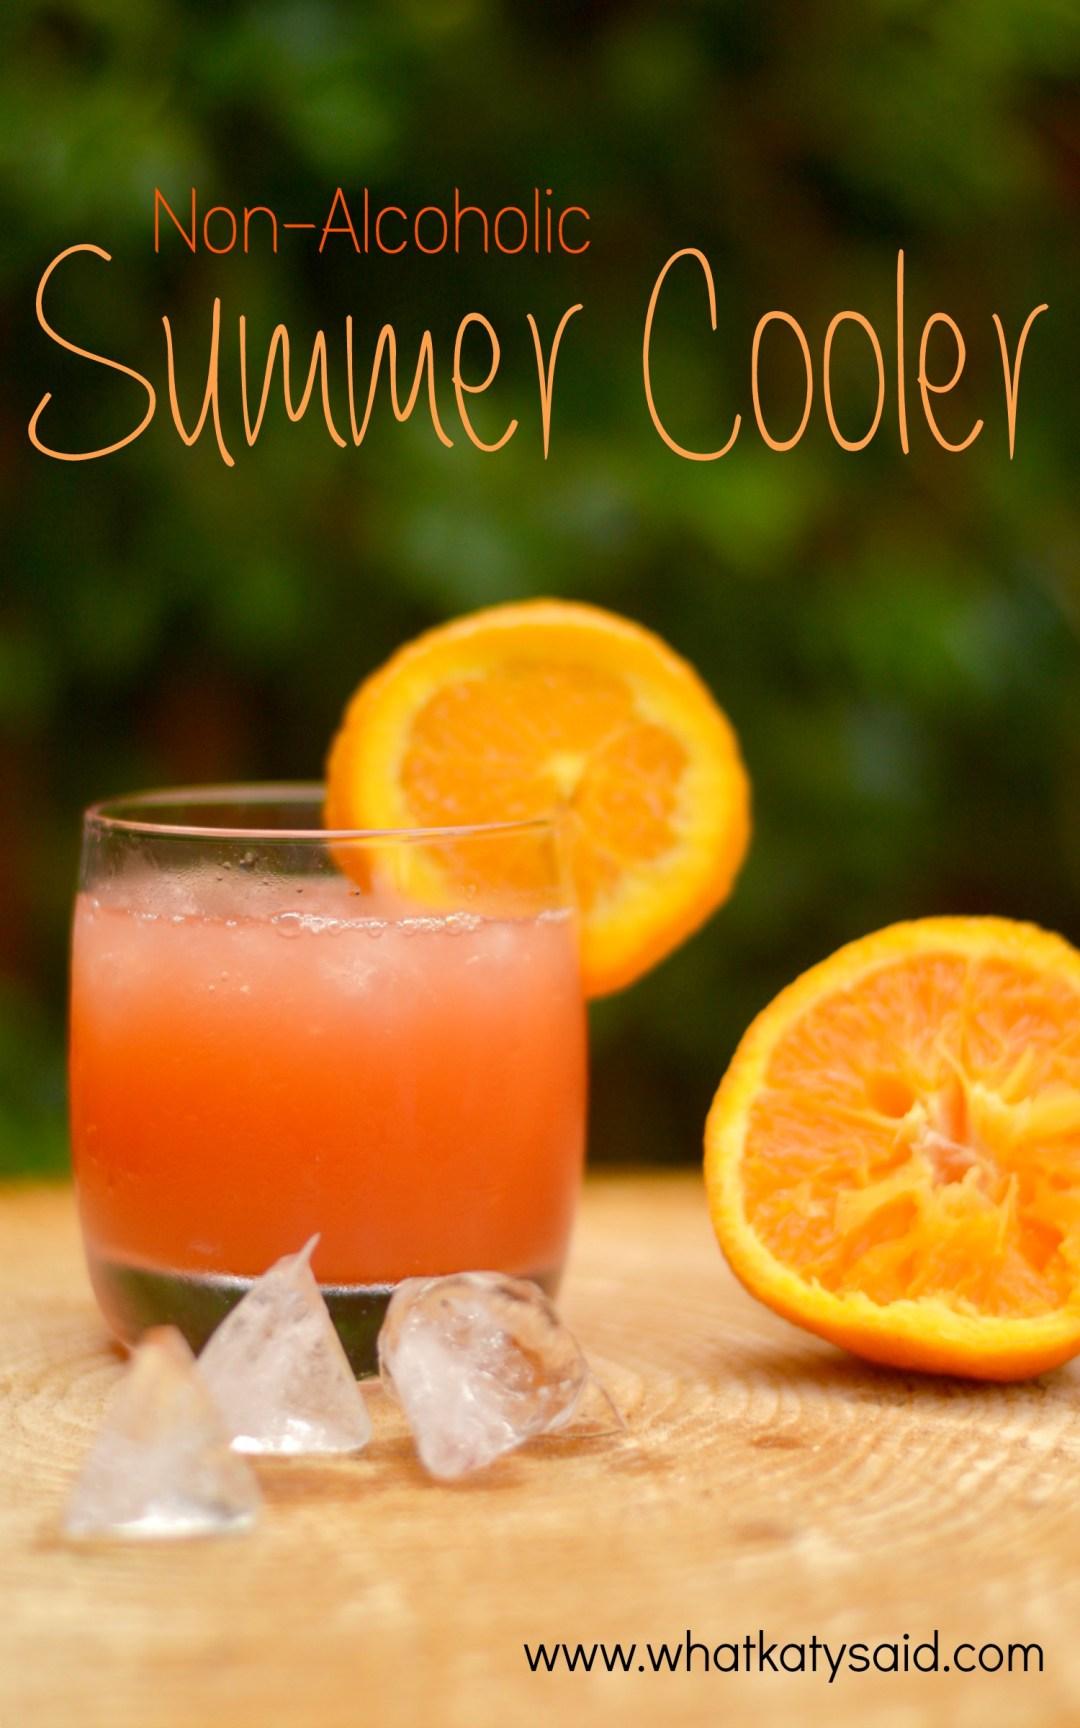 Non-Alcoholic Summer Cooler - Cocktail Recipe